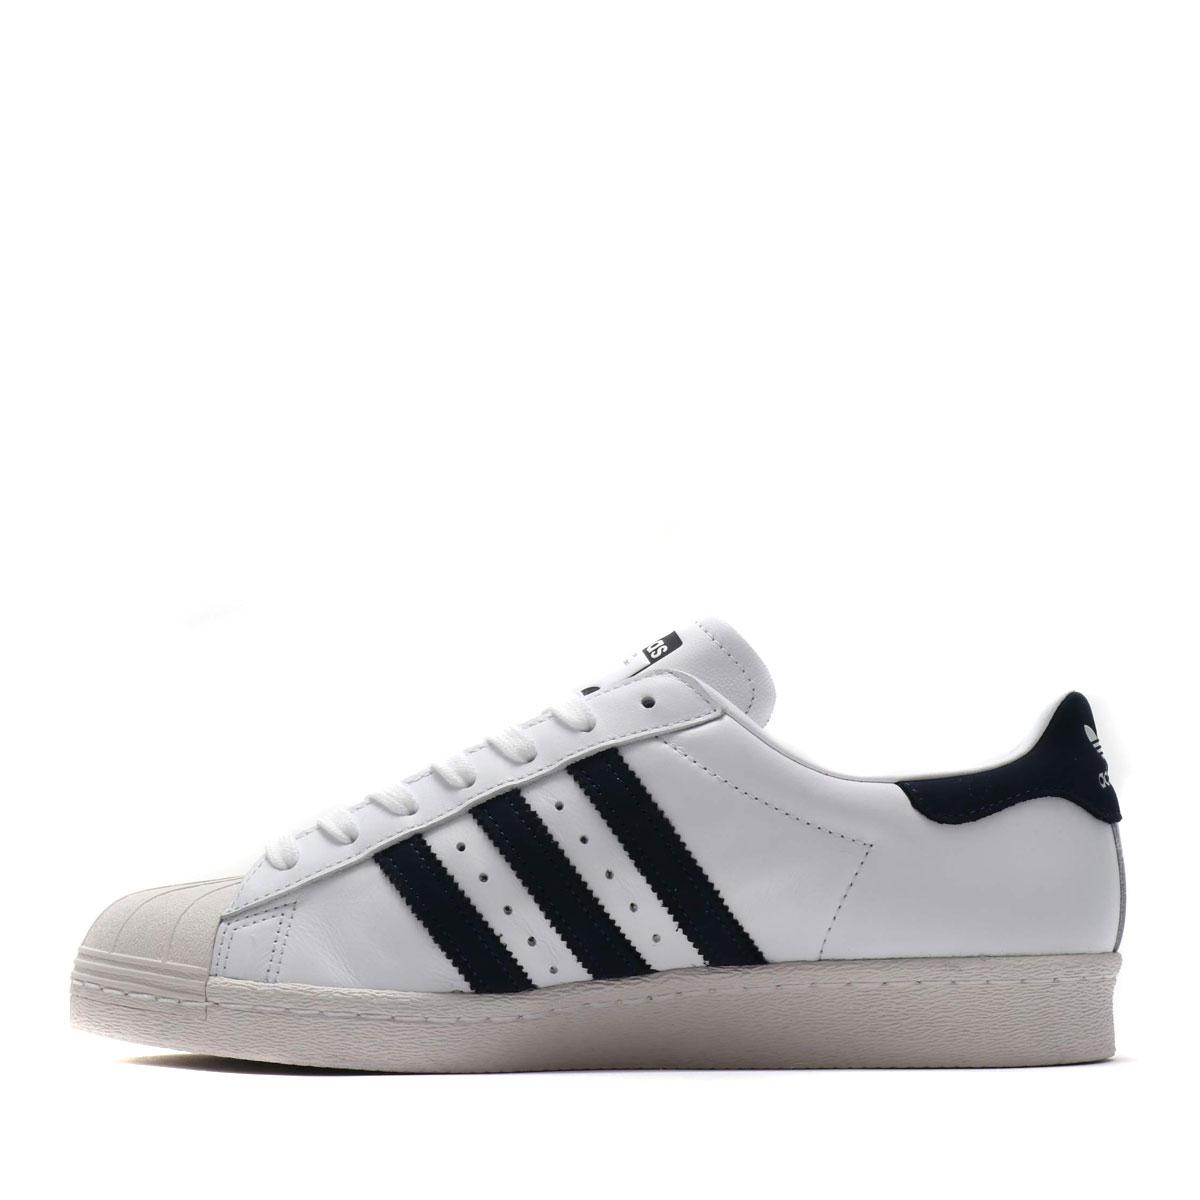 on sale bf37d 3c701 adidas Originals SUPERSTAR 80s (Running White/College Navy) (Adidas  originals superstar)